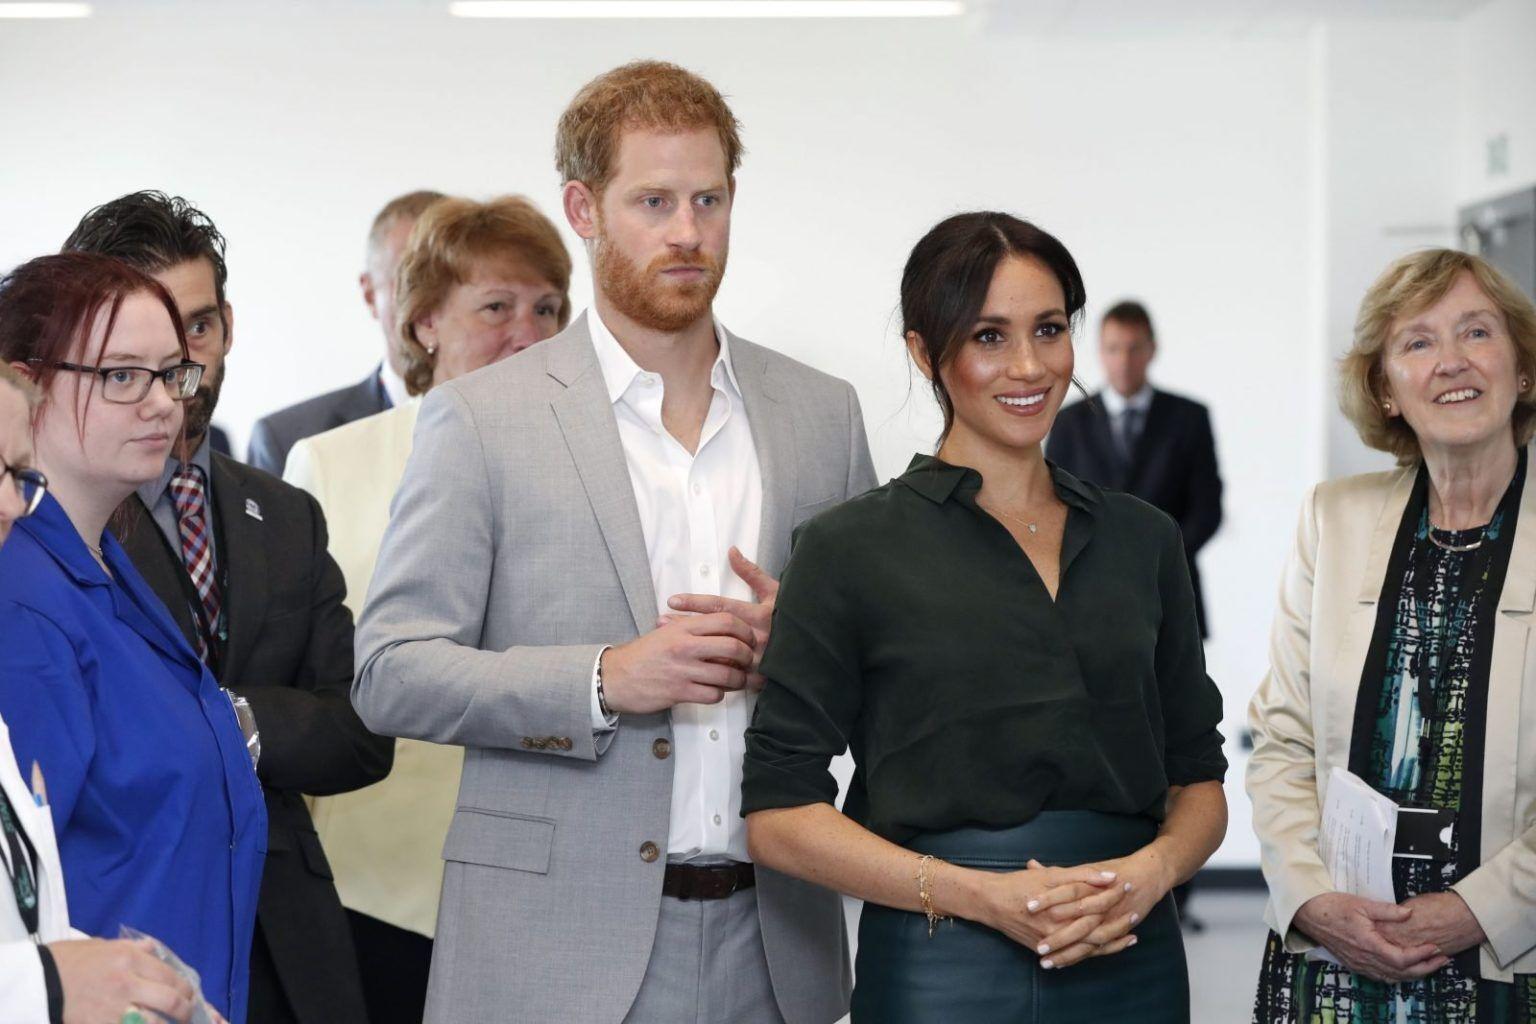 Photo of Тысячи британцев подписали петицию чтобы лишить Меган Маркл и Принца Гарри титула